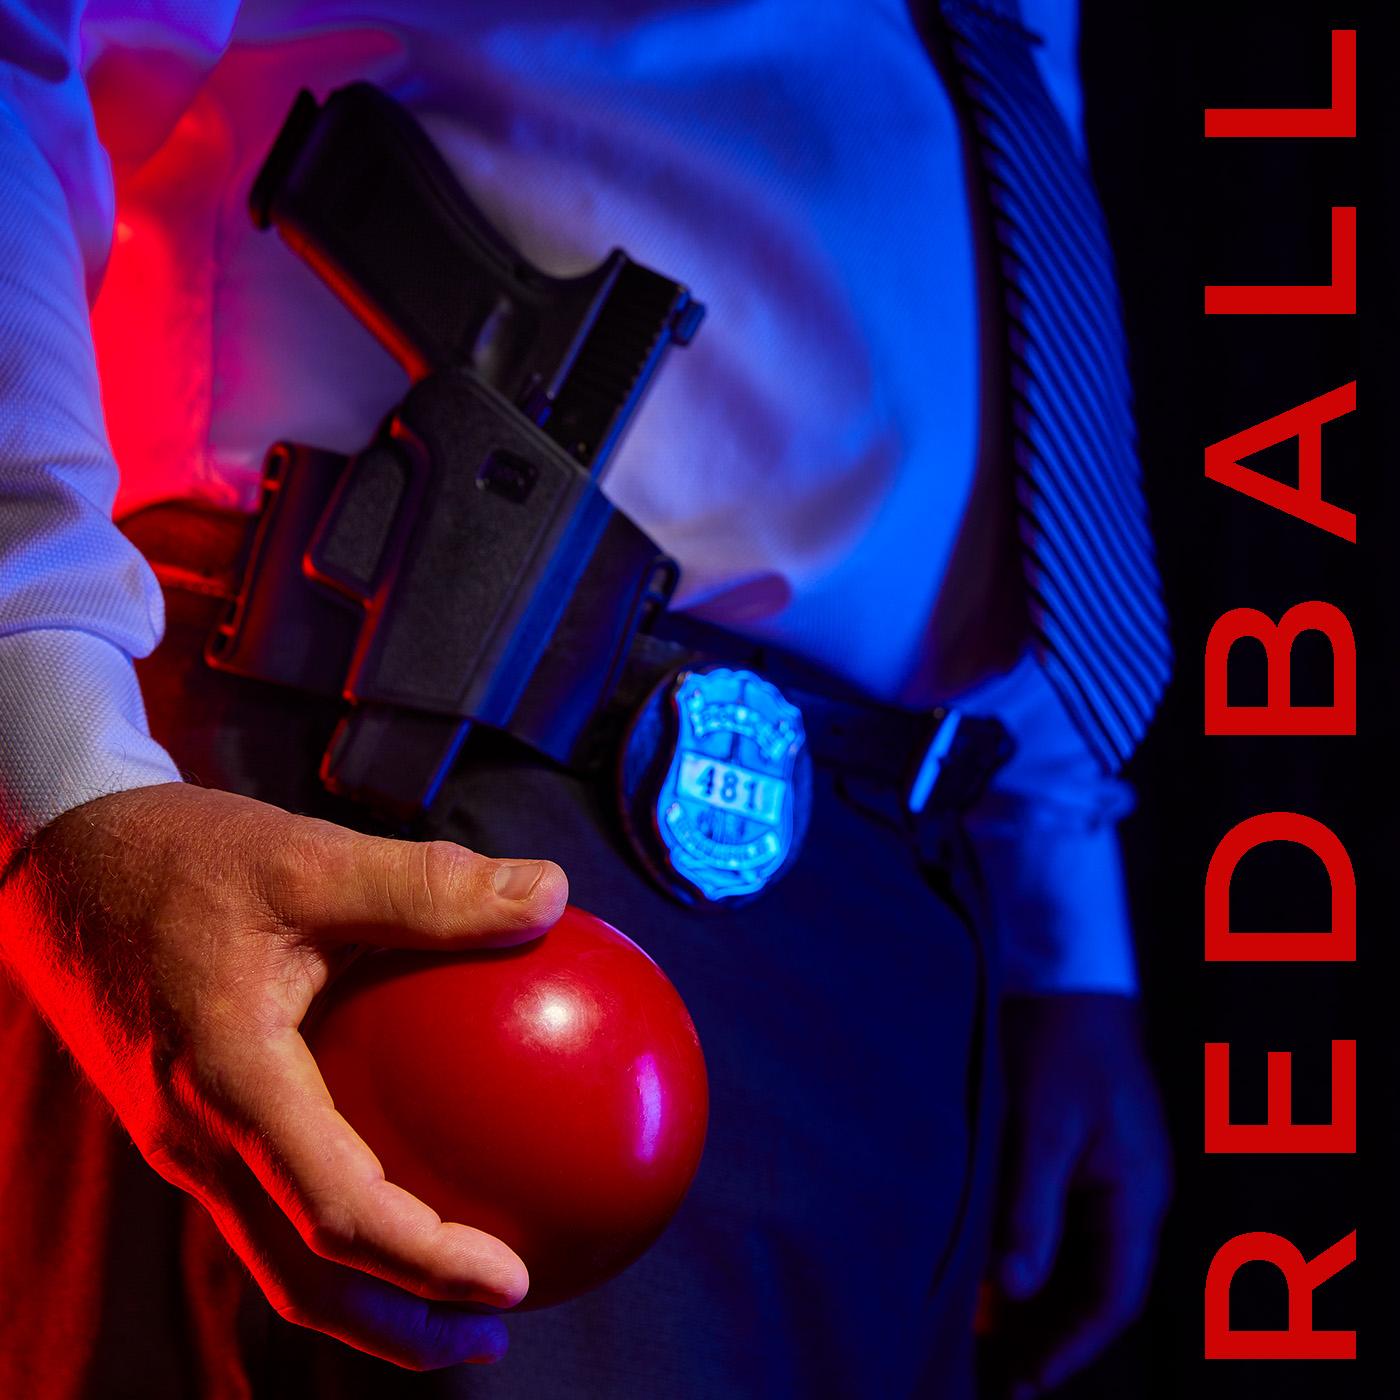 Redball cover photo